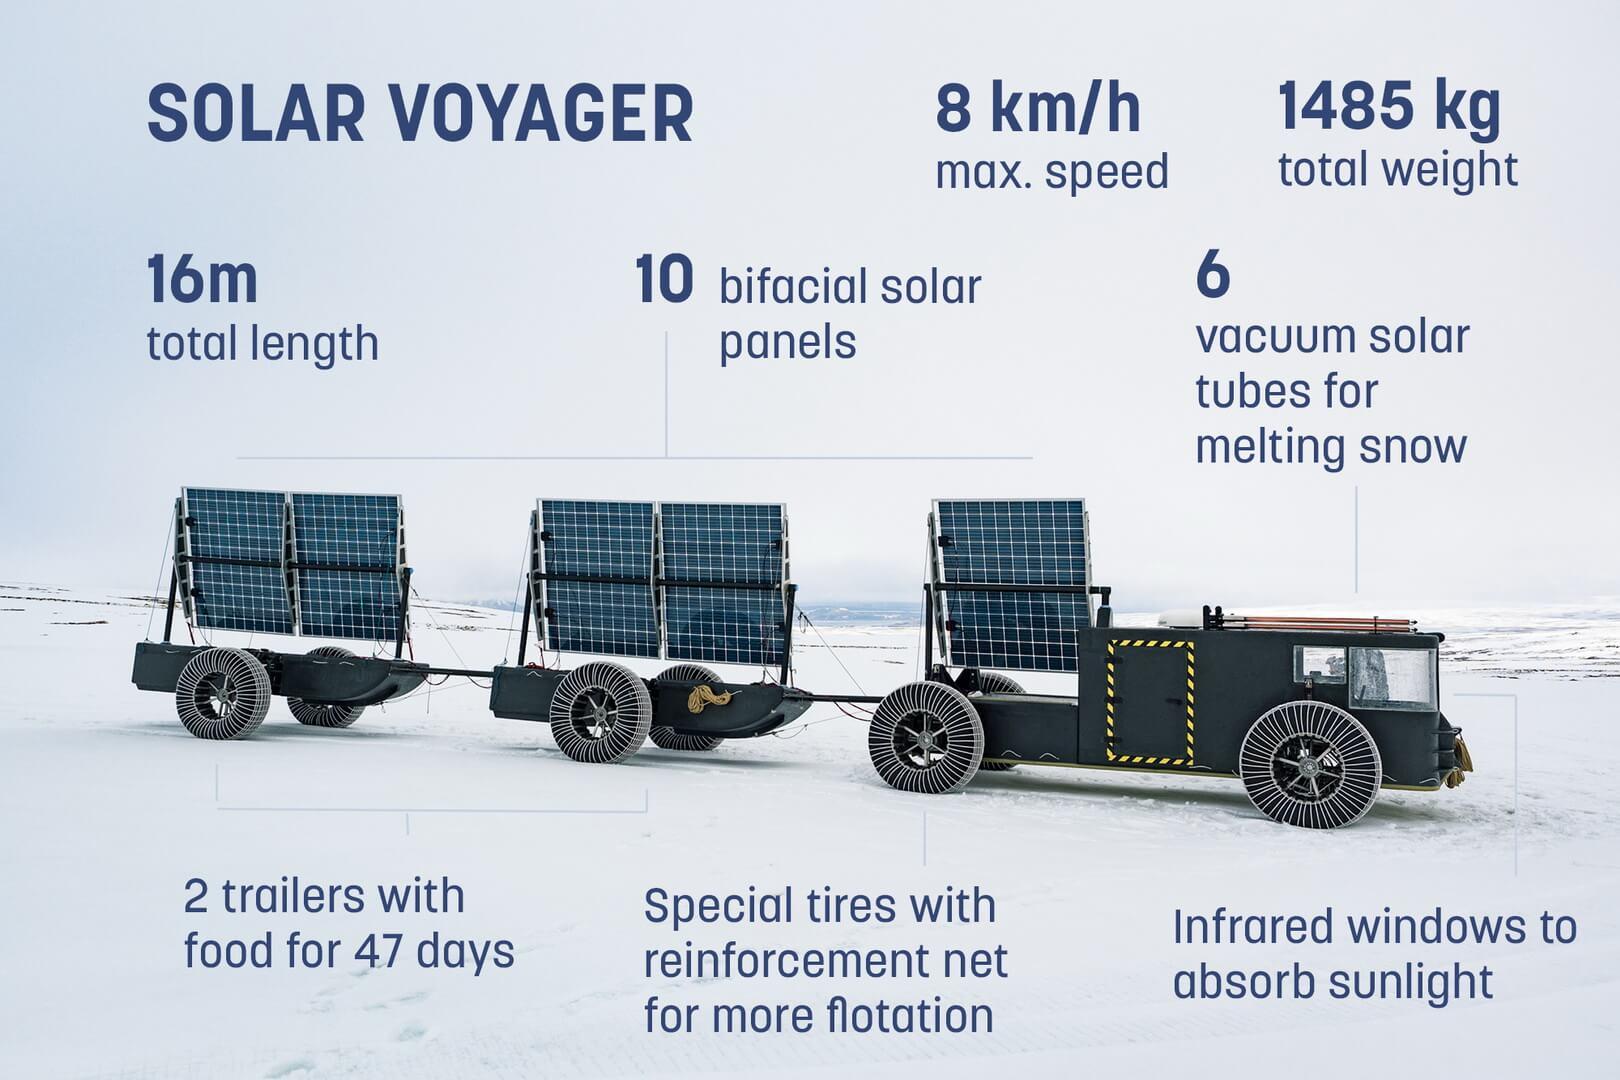 Характеристики электрического багги Solar Voyager